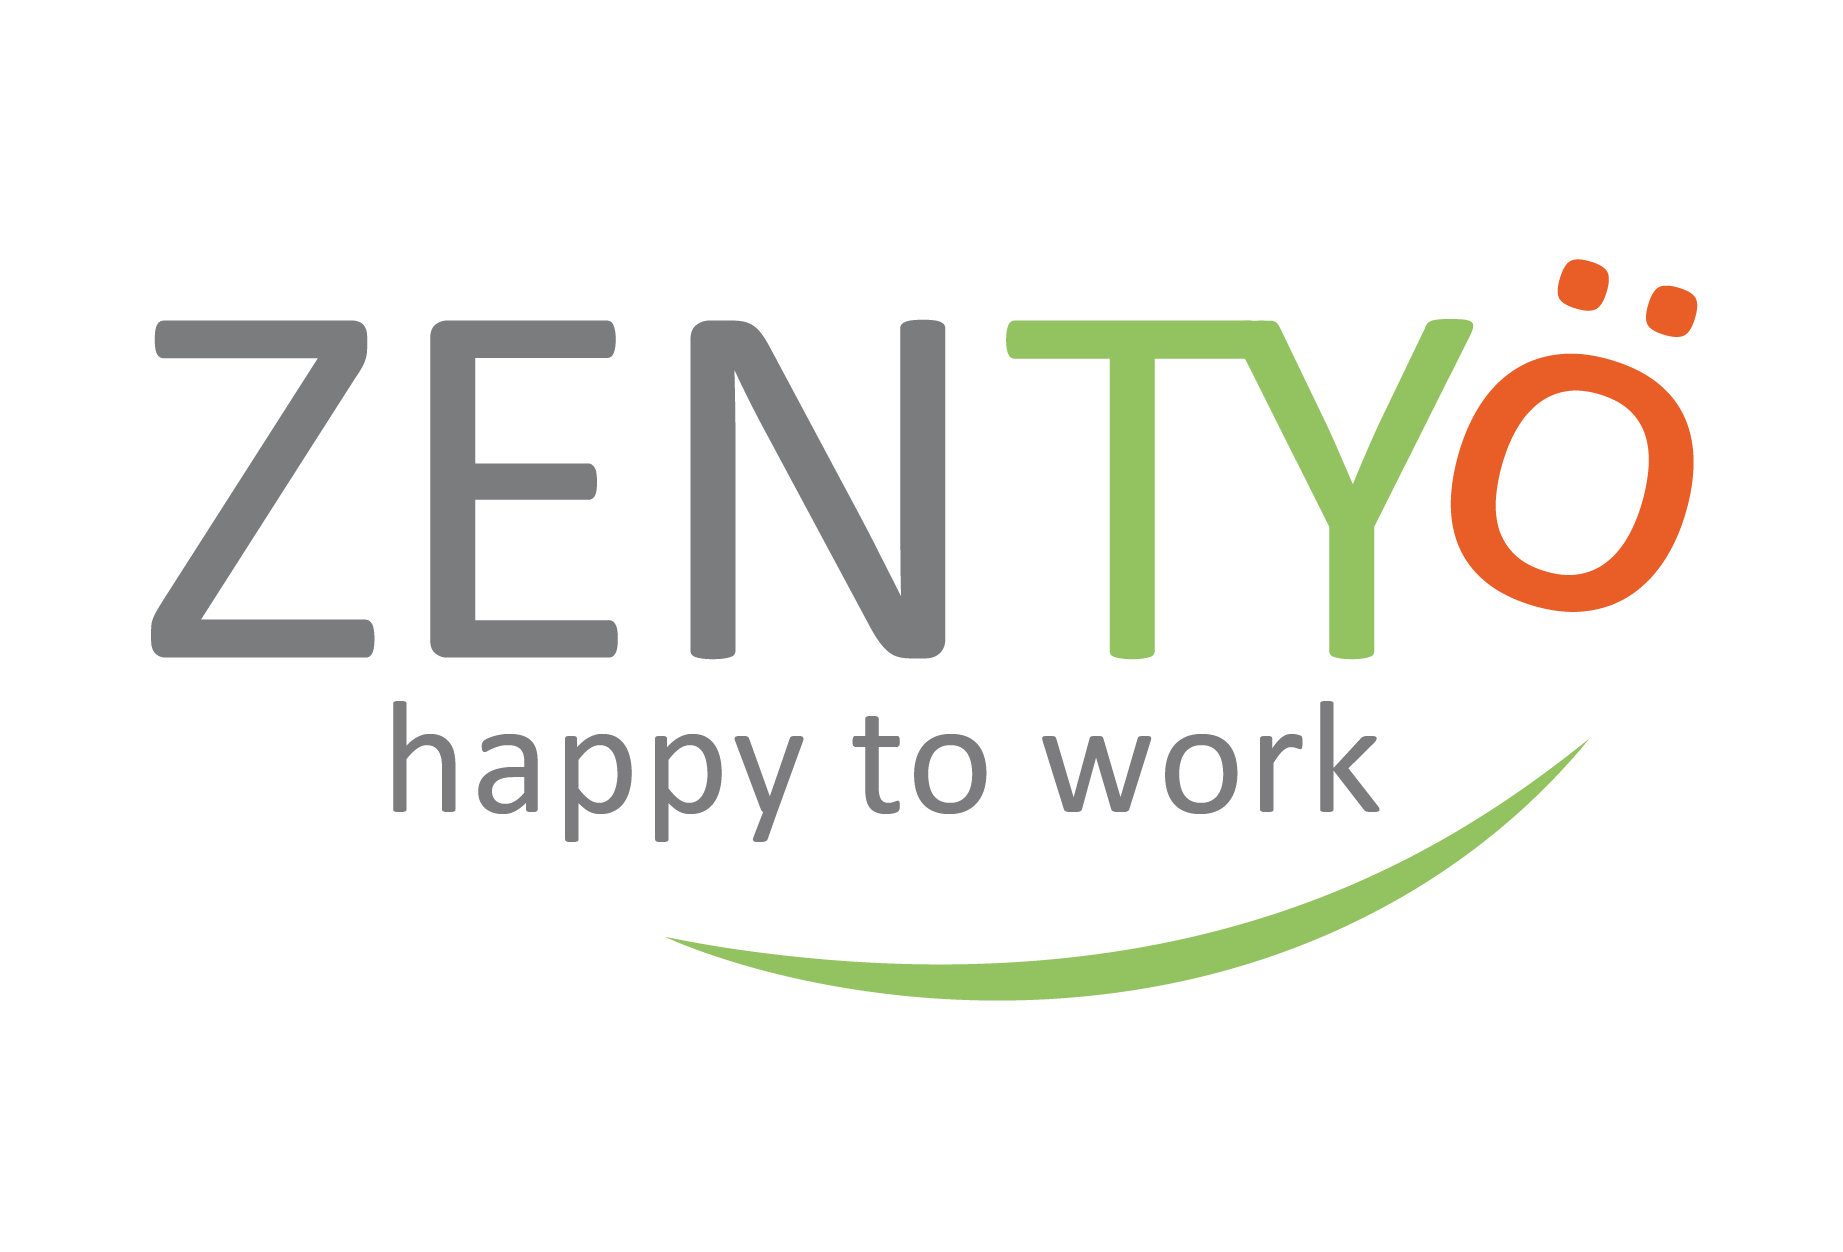 zentyo.fr